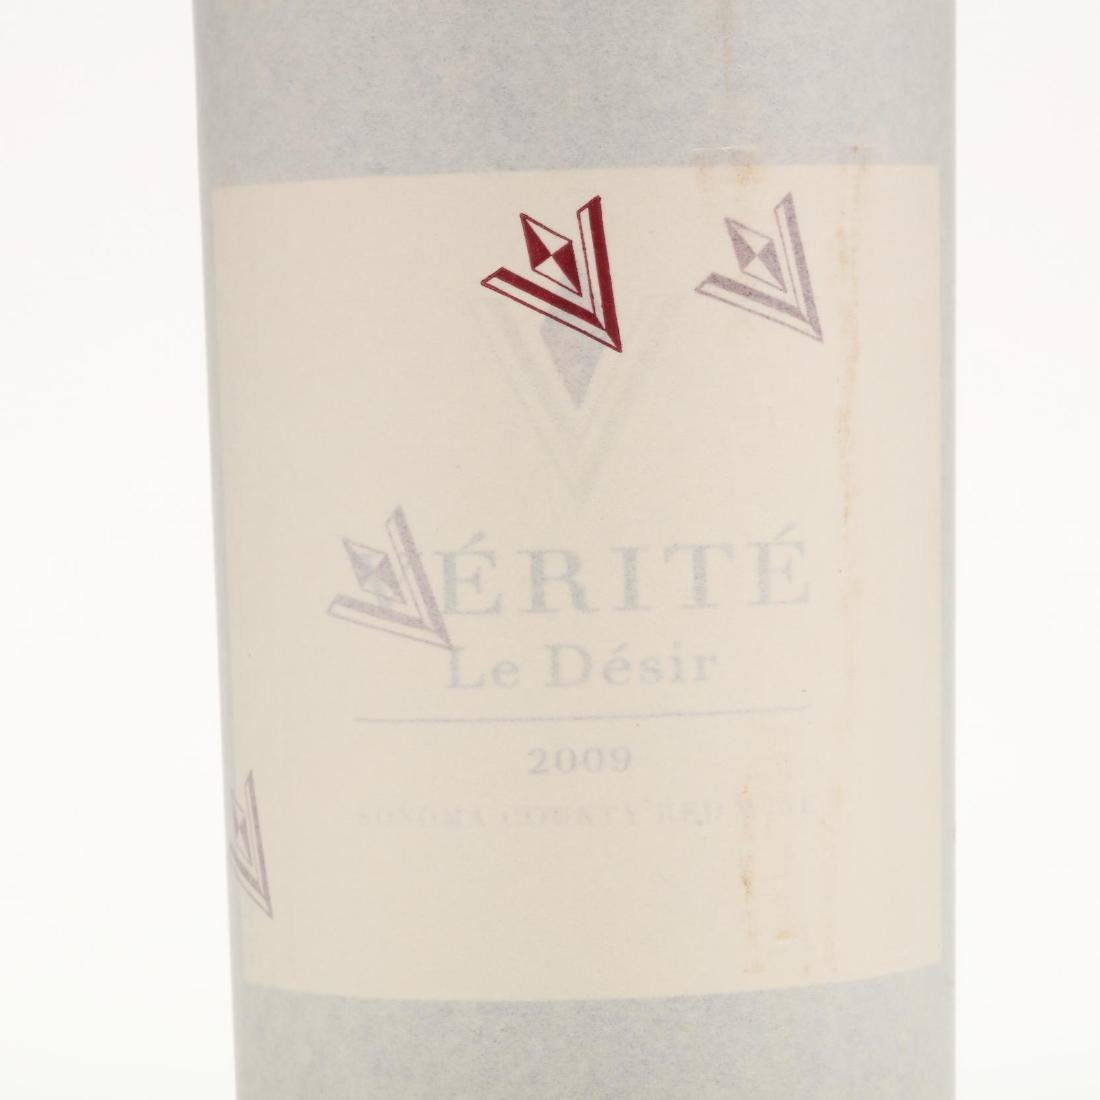 Verite - Vintage 2009 - 2